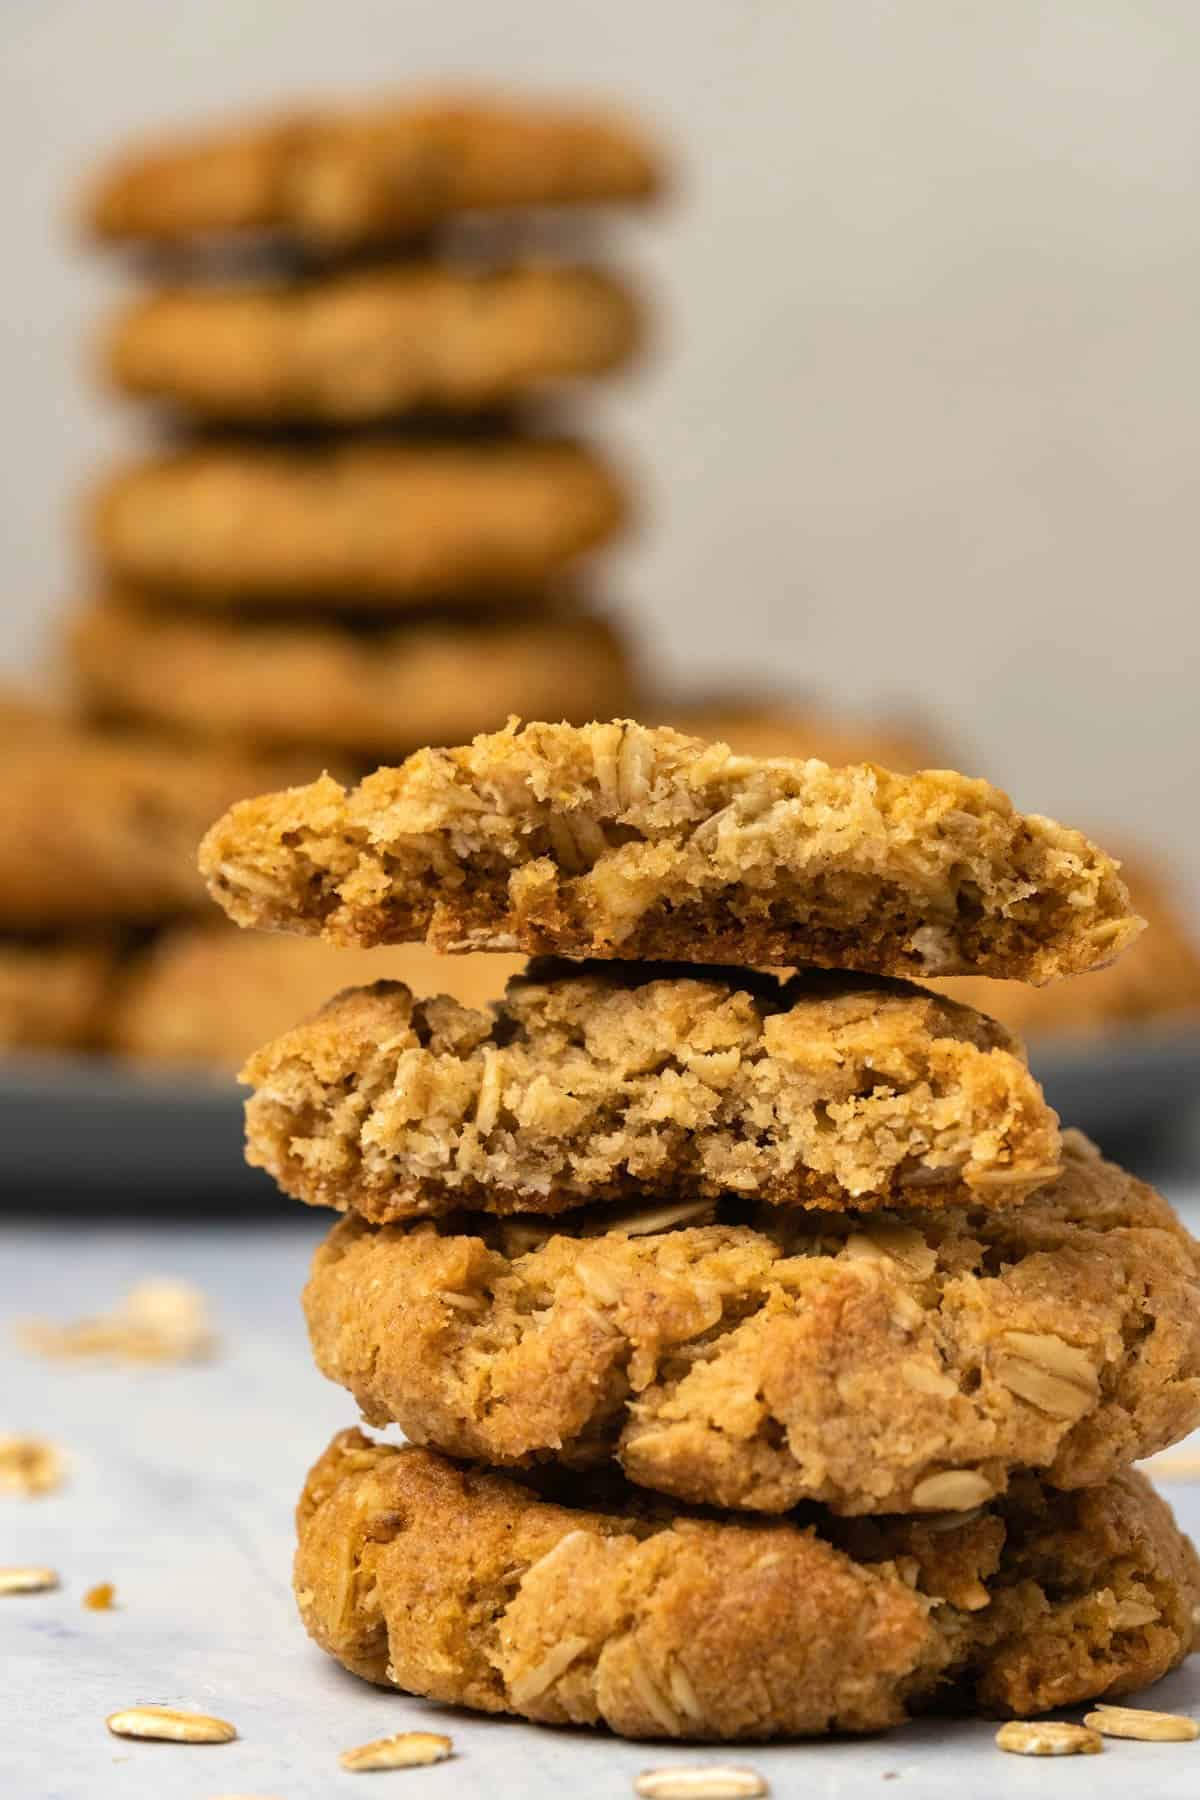 Stack of oatmeal cookies with the top cookie broken in half.